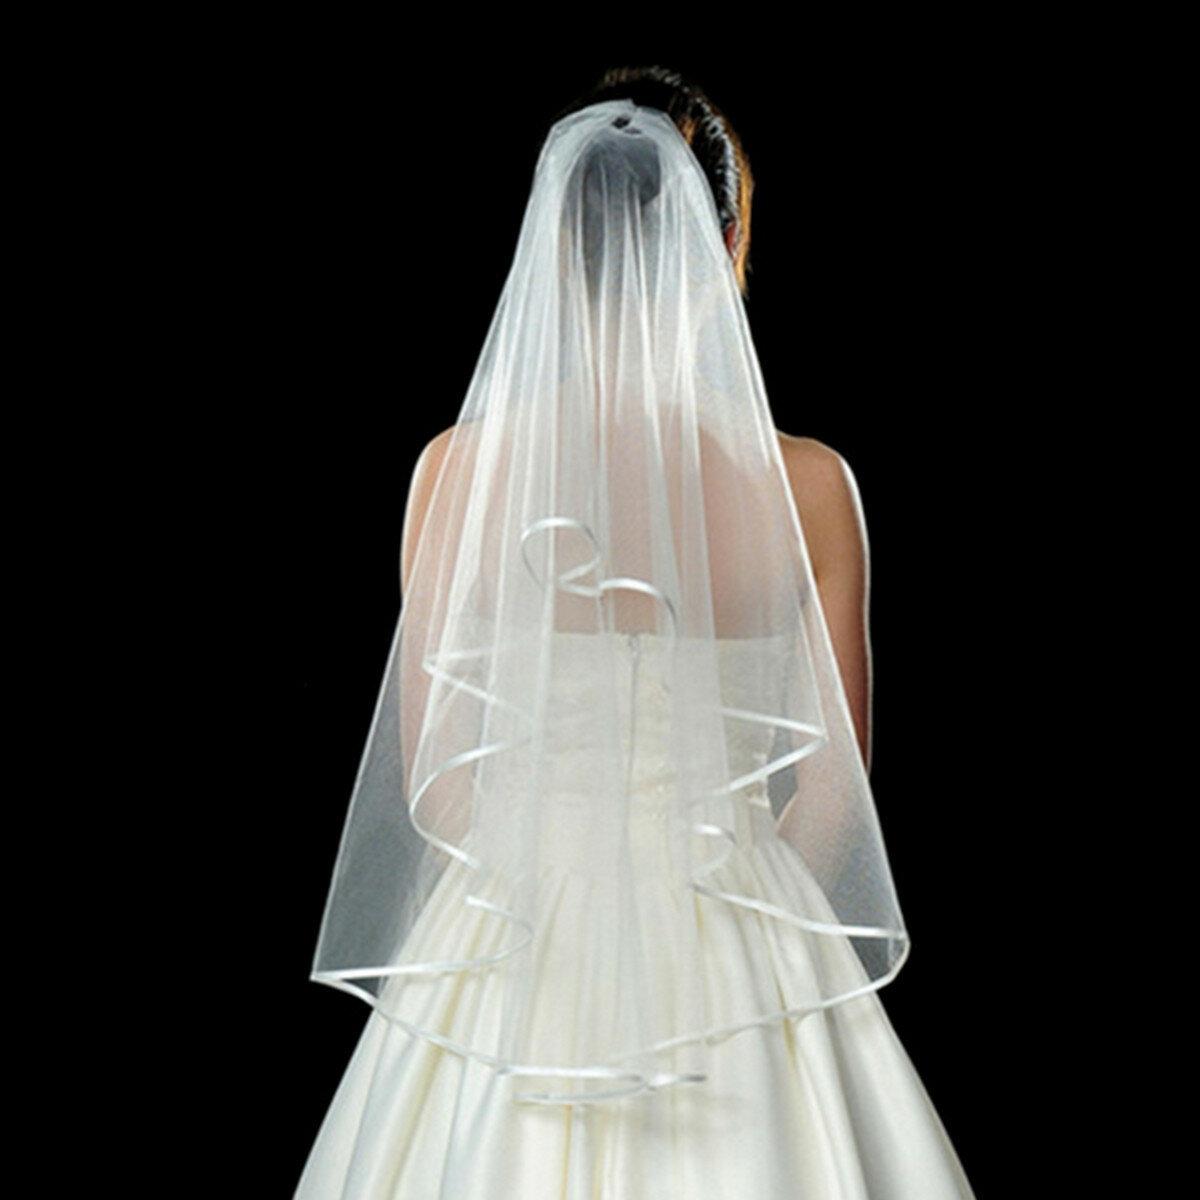 3 Layers Bride Ivory White Wedding Bridal Short Satin Edge Veil With Comb